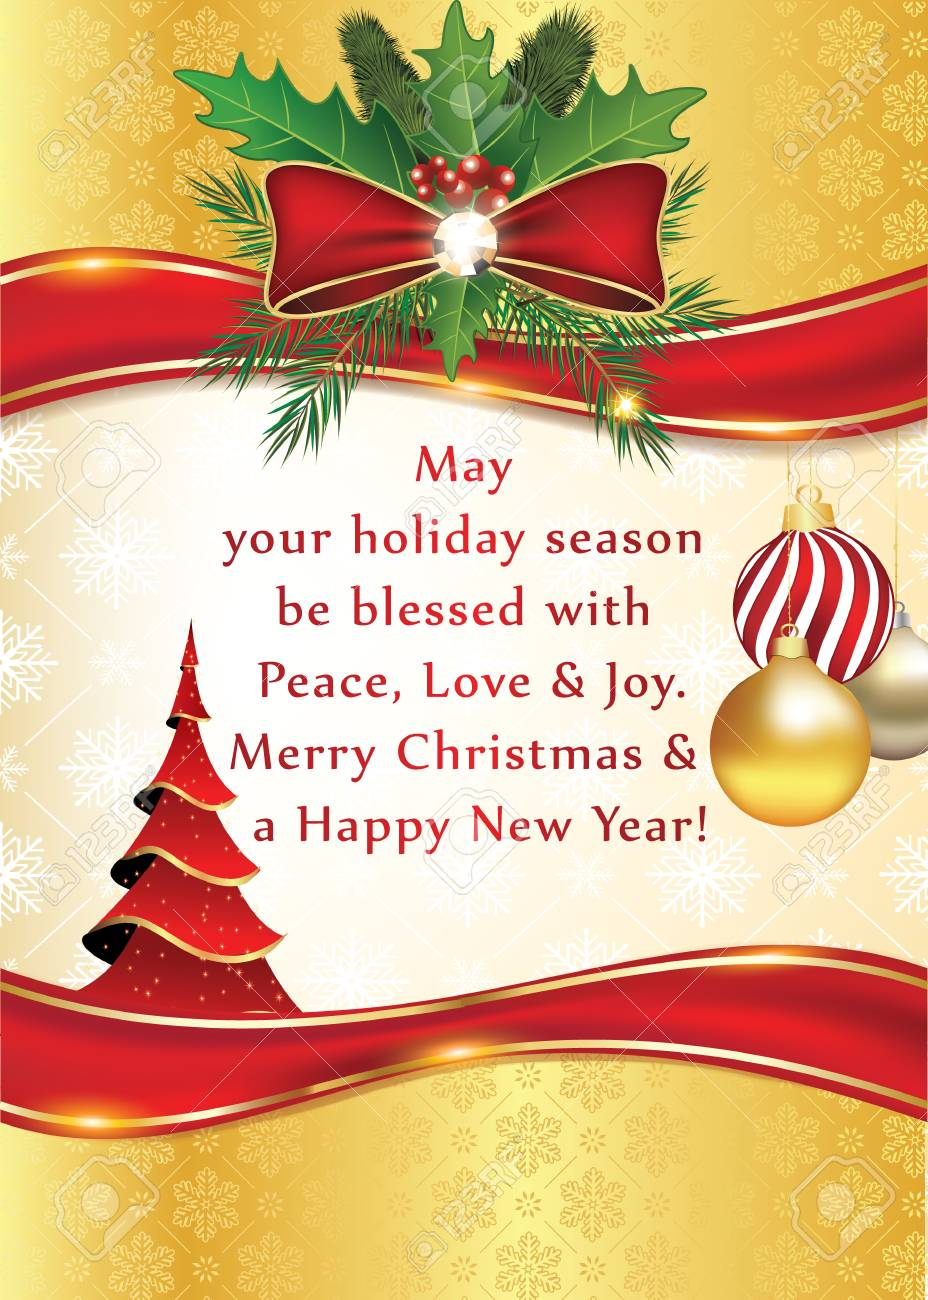 Elegant Winter Season Greeting Card For Print For Christmas And ...